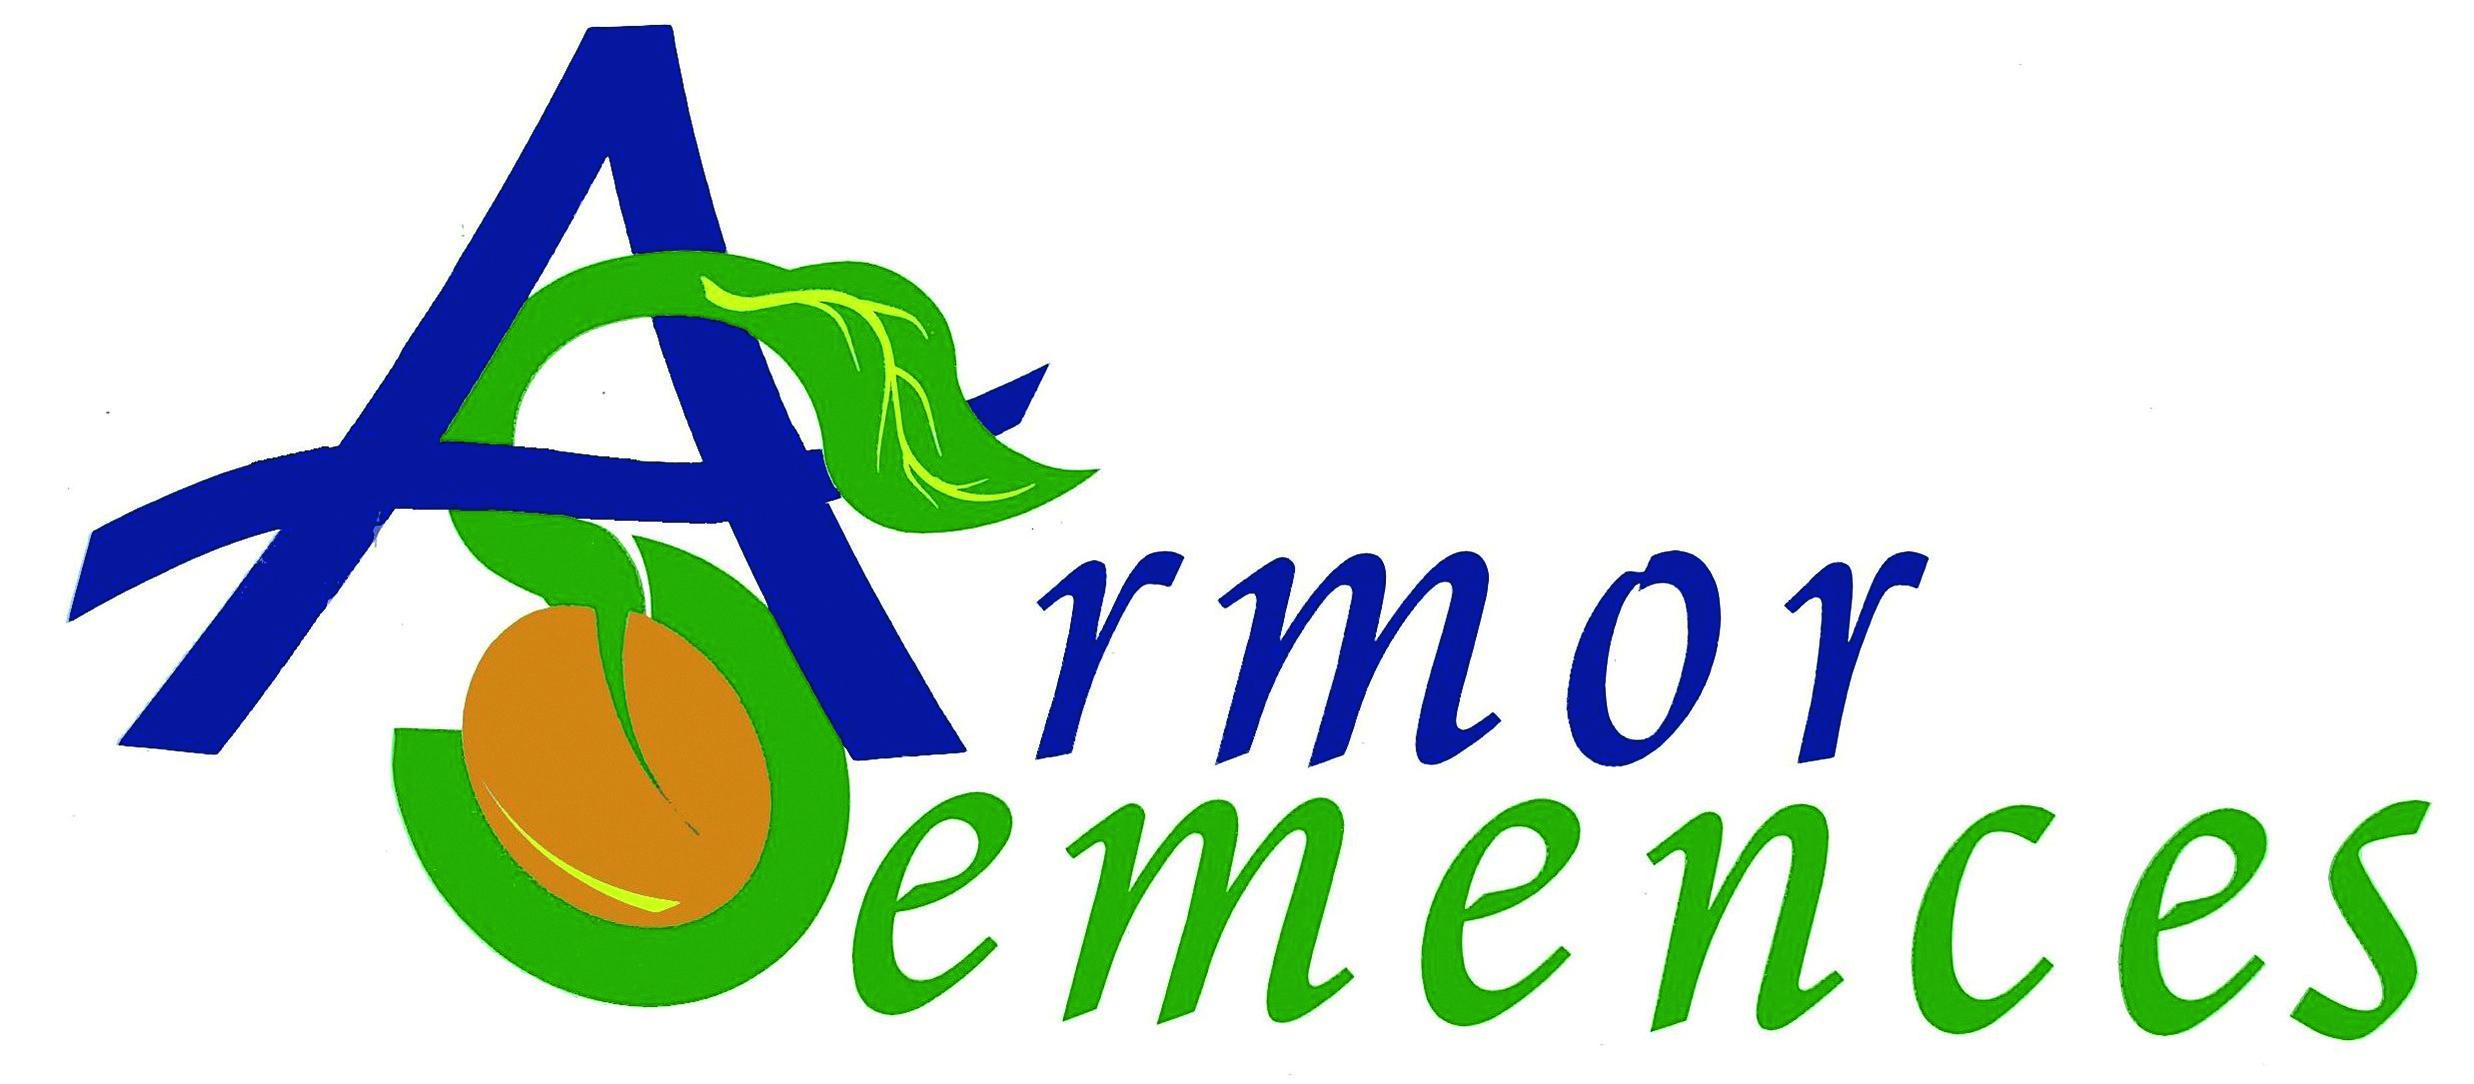 ARMOR SEMENCES